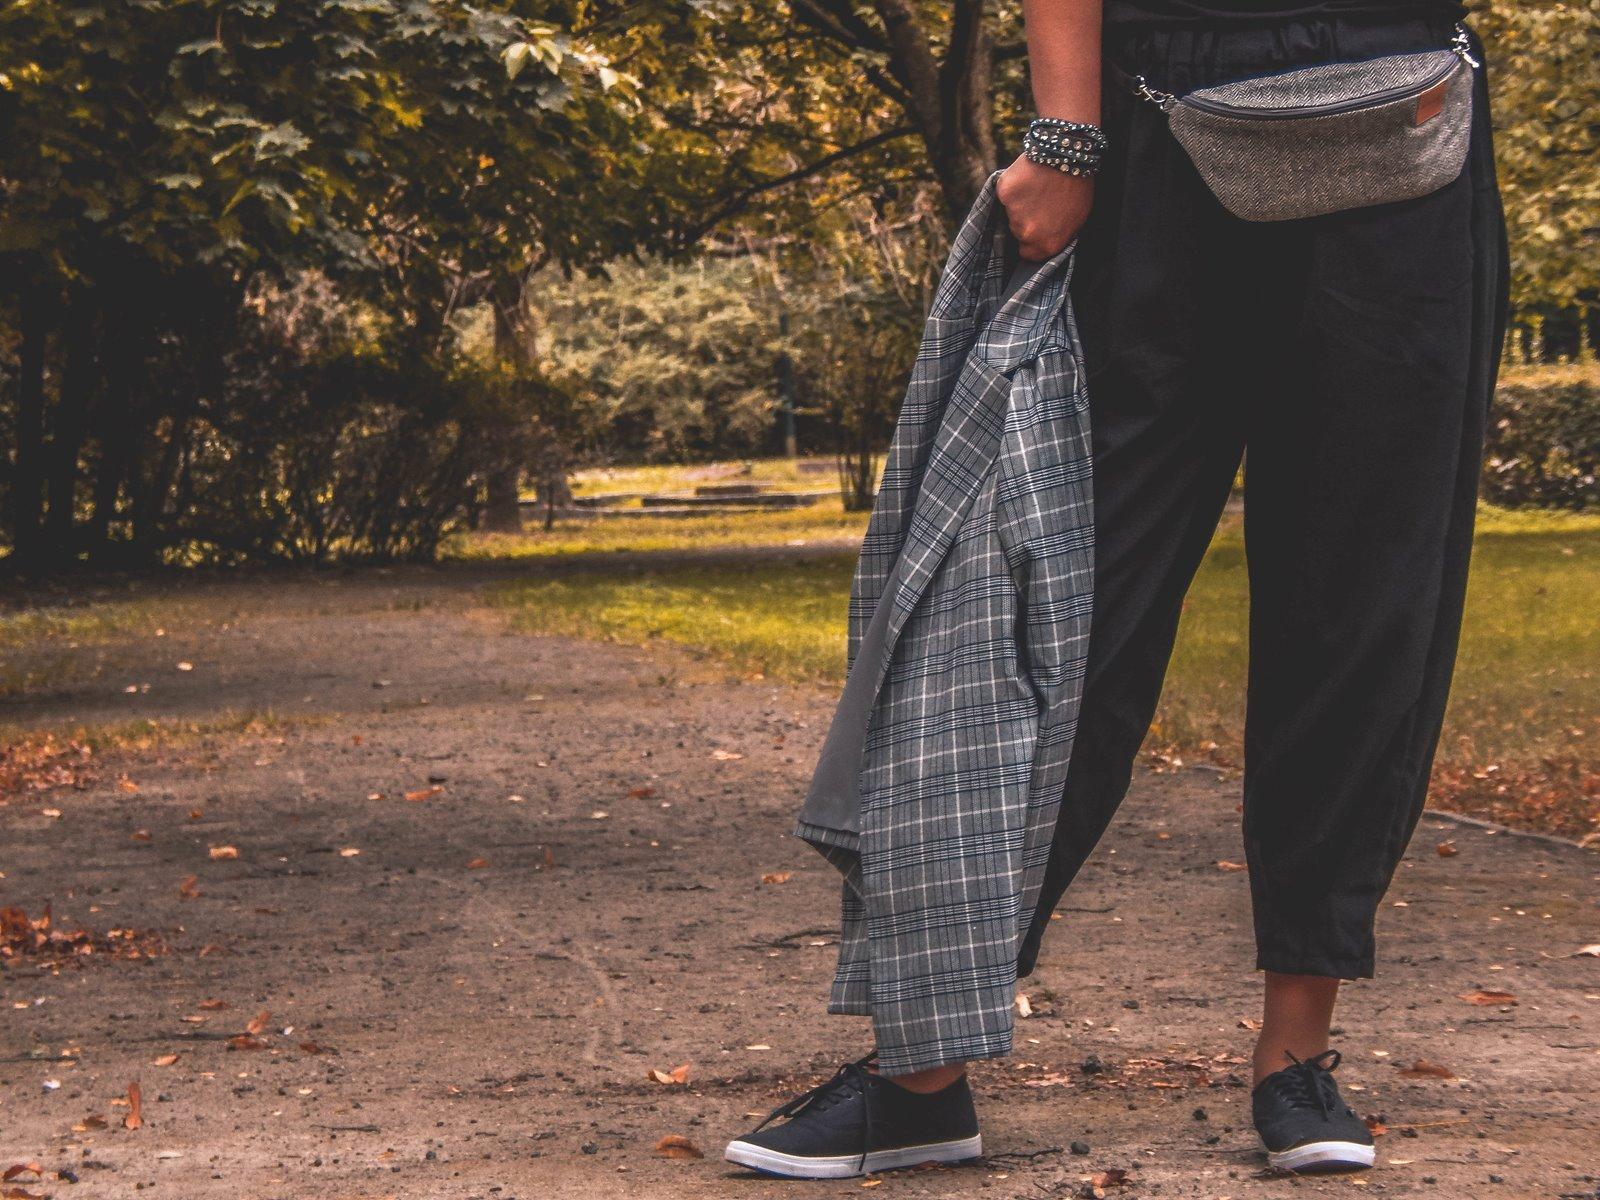 1 współpraca marka bloger stylizacja cado nerka komin na jesień szara marynarka nakd zniżka cena promocja blondynka selfieroom moda damska blog vansy kuloty jak nosić modna polka łódź lifestyle